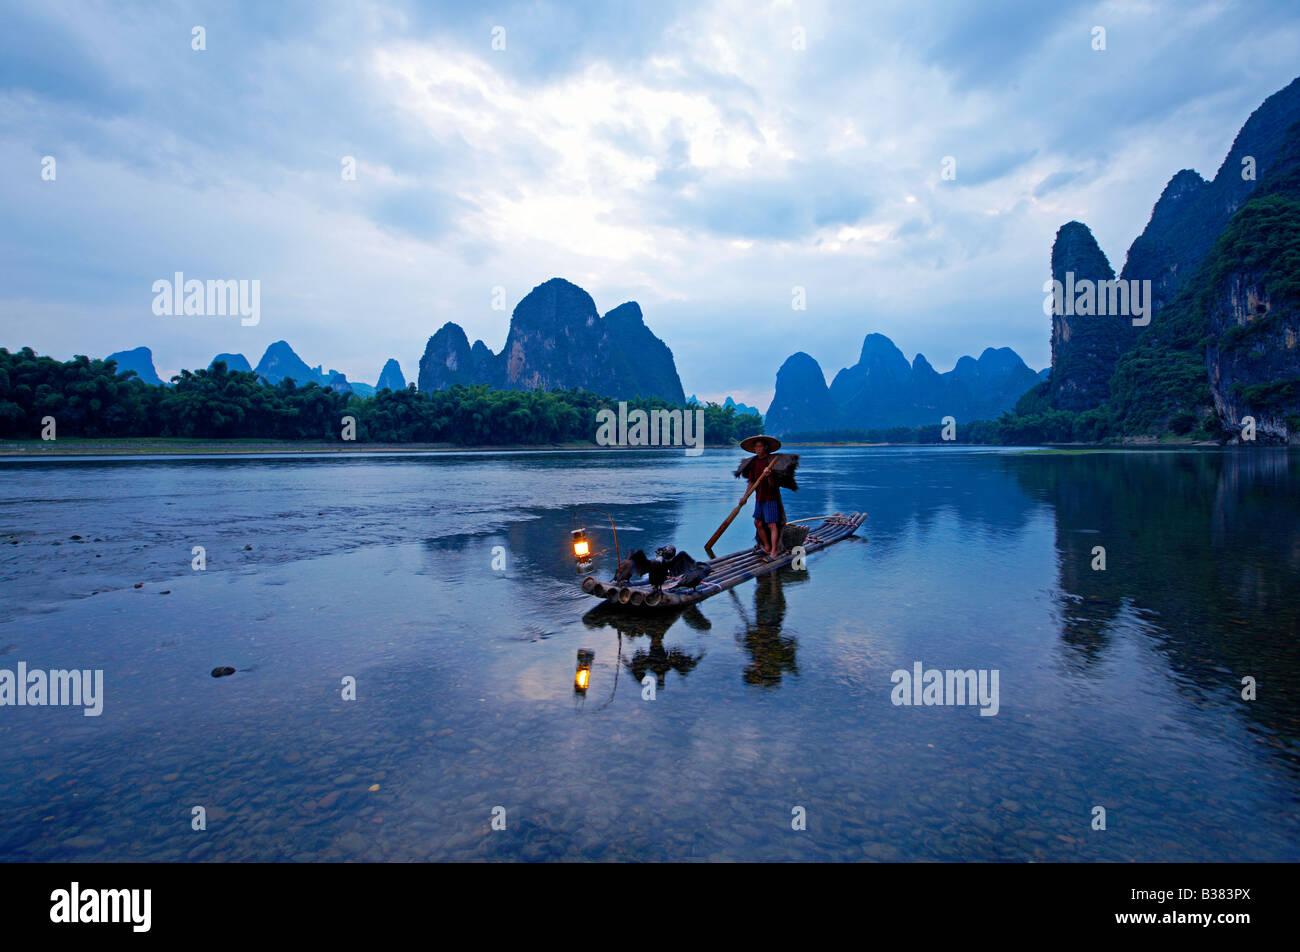 Cormorán pescador en el río Li Lijang Guilin Xingping provincia China de despacho modelo 701 Imagen De Stock